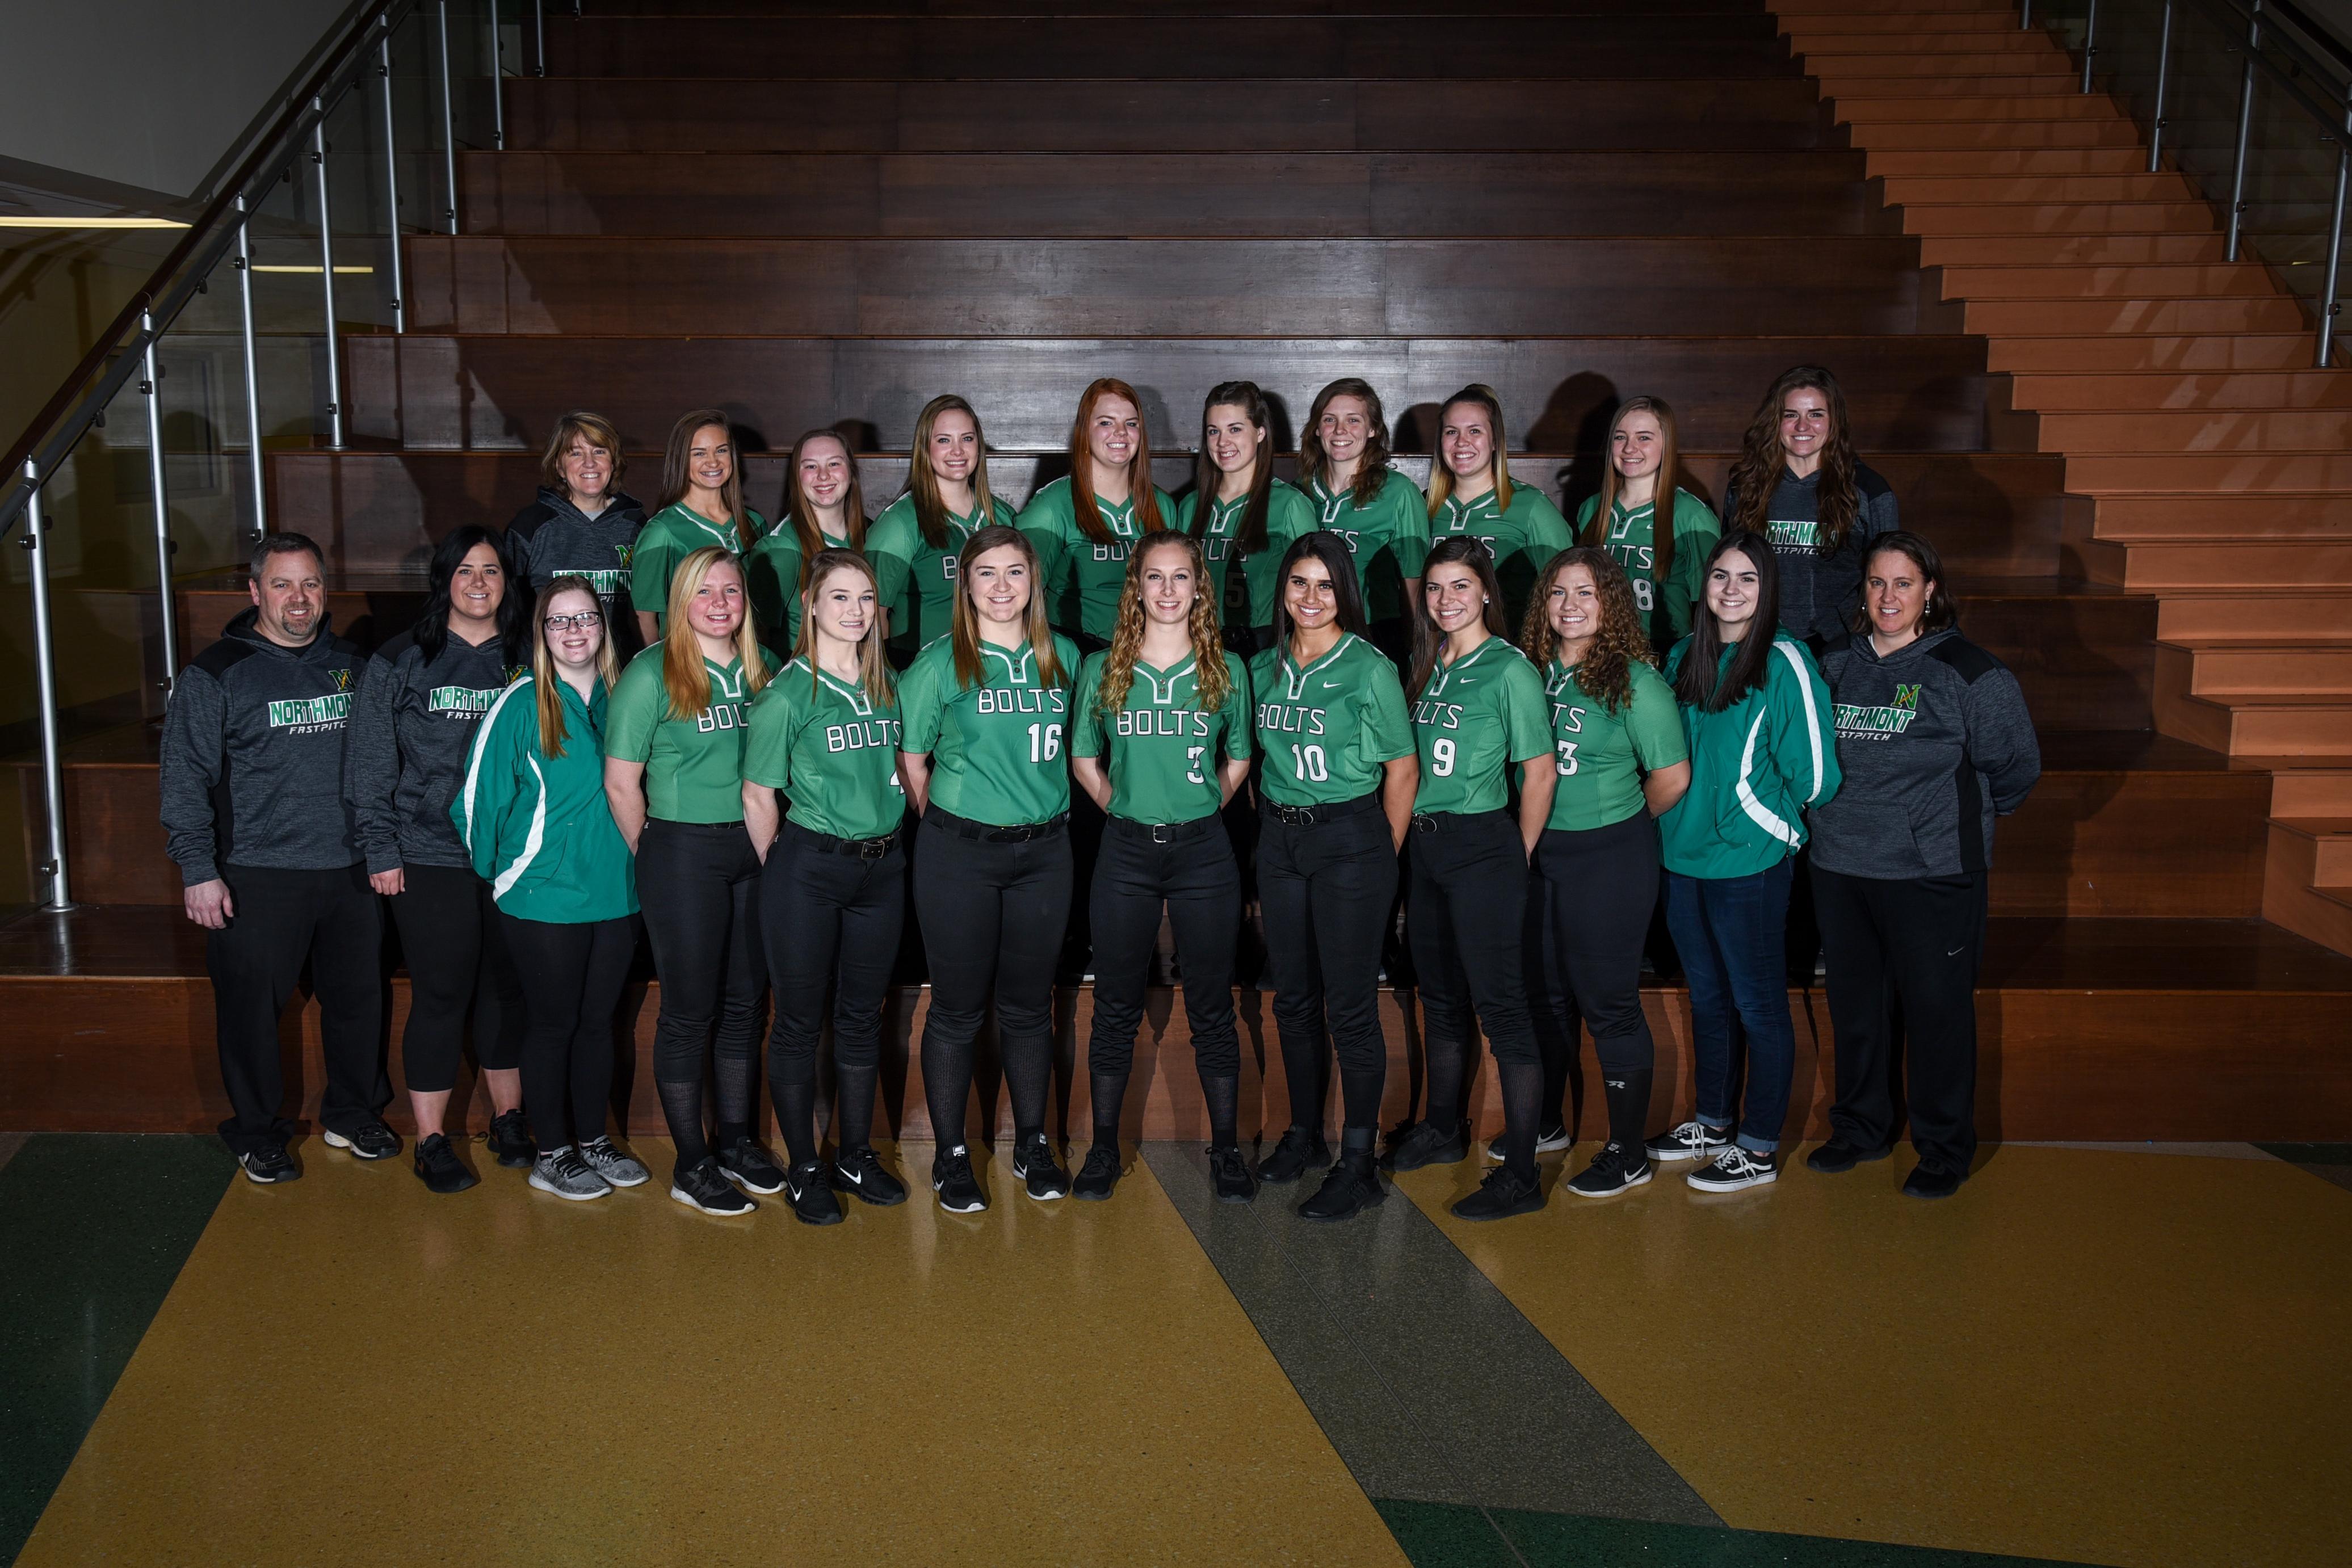 Northmont softball team has high hopes